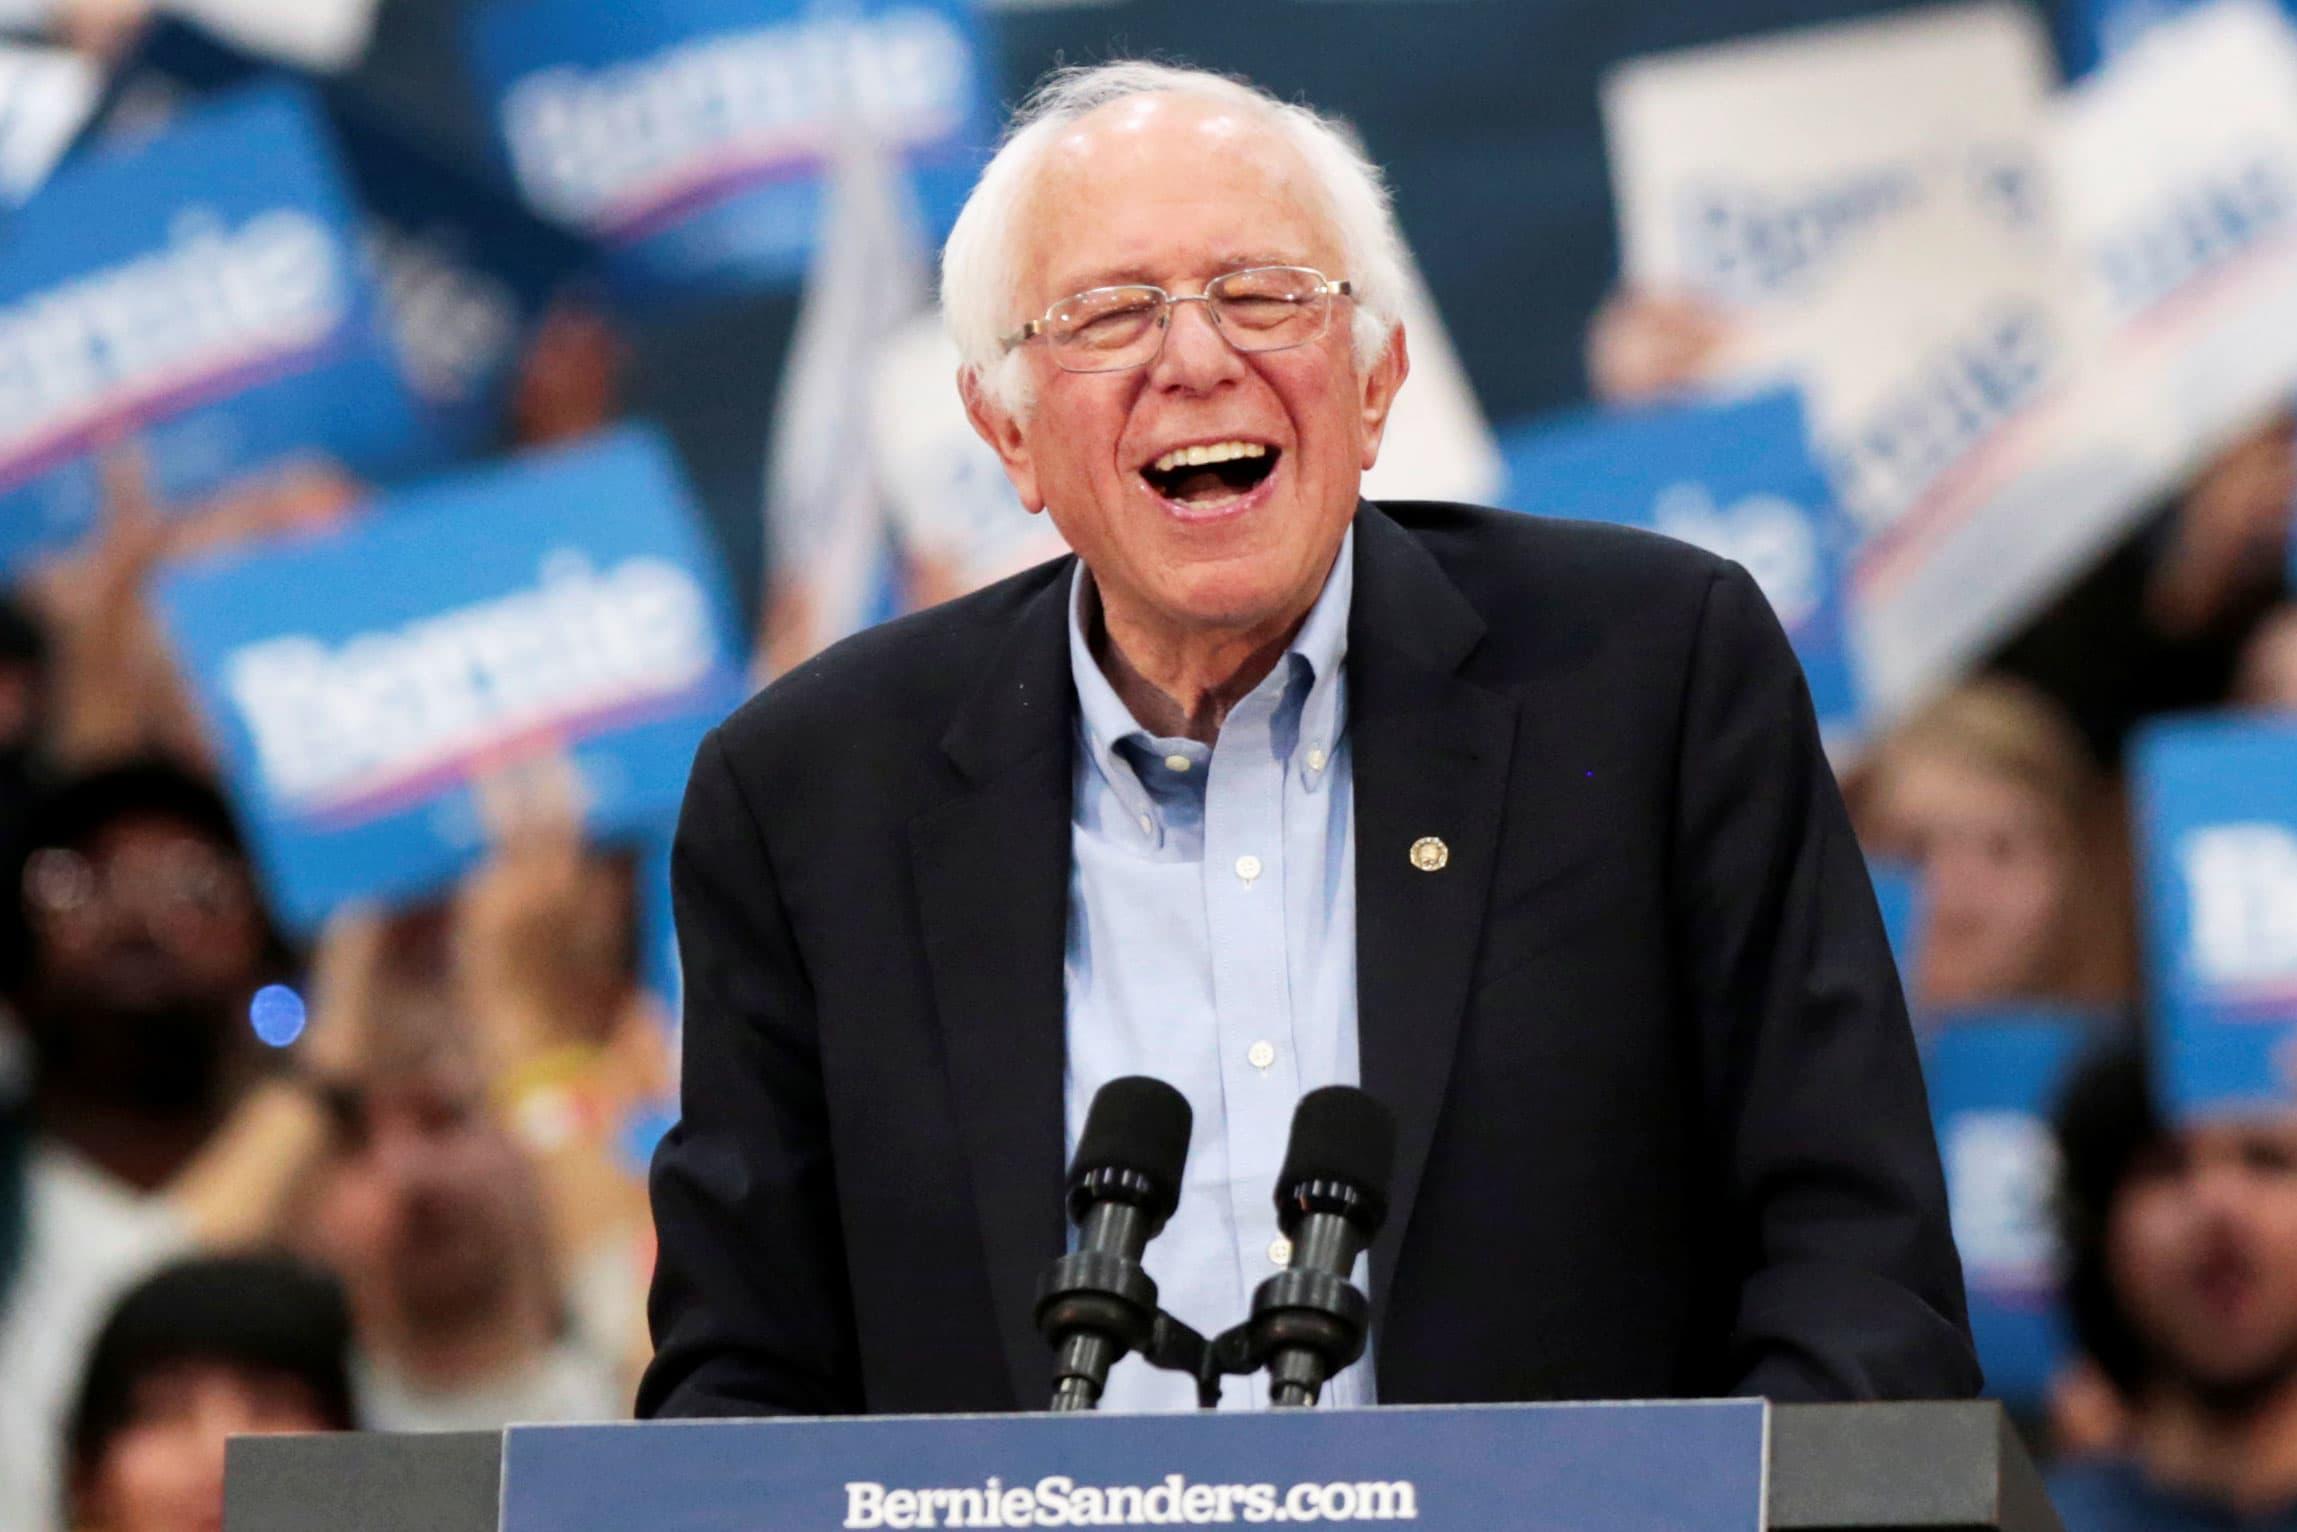 Bernie Sanders raised $34.5 million in 4Q in 2020 Democratic primary